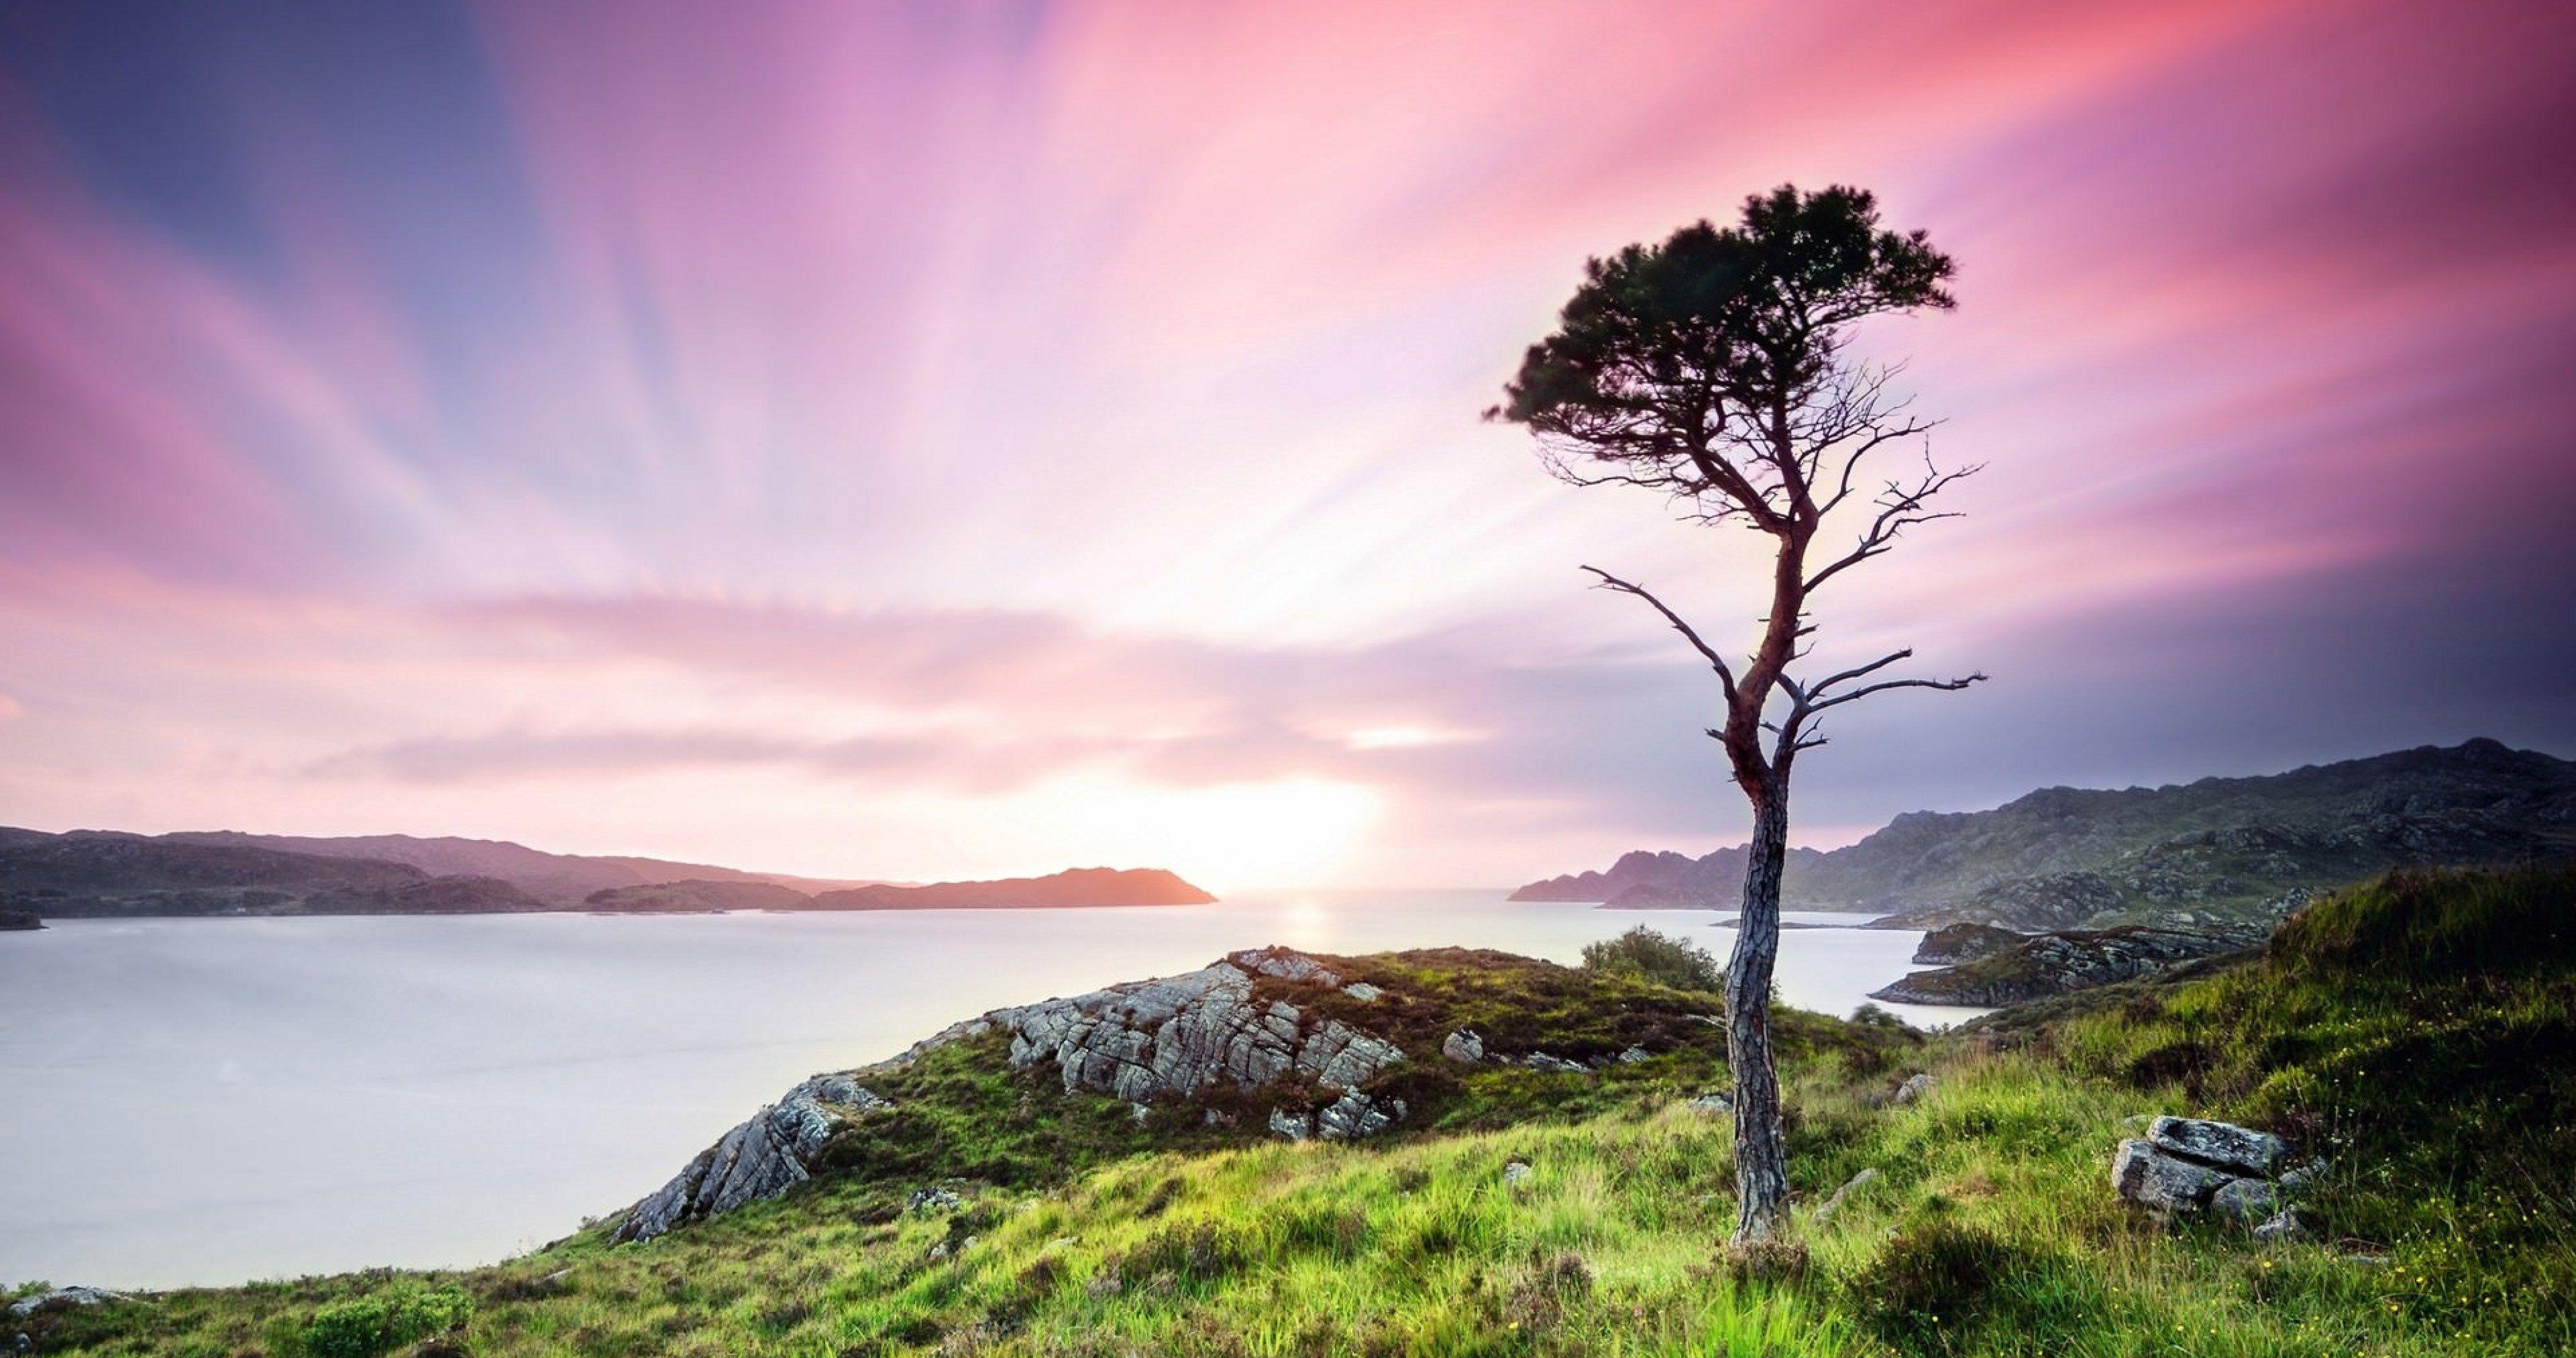 United Kingdom Scotland Twilight Landscape Wide 4k Ultra Hd Wallpaper Landscape Scotland Wallpaper Nature